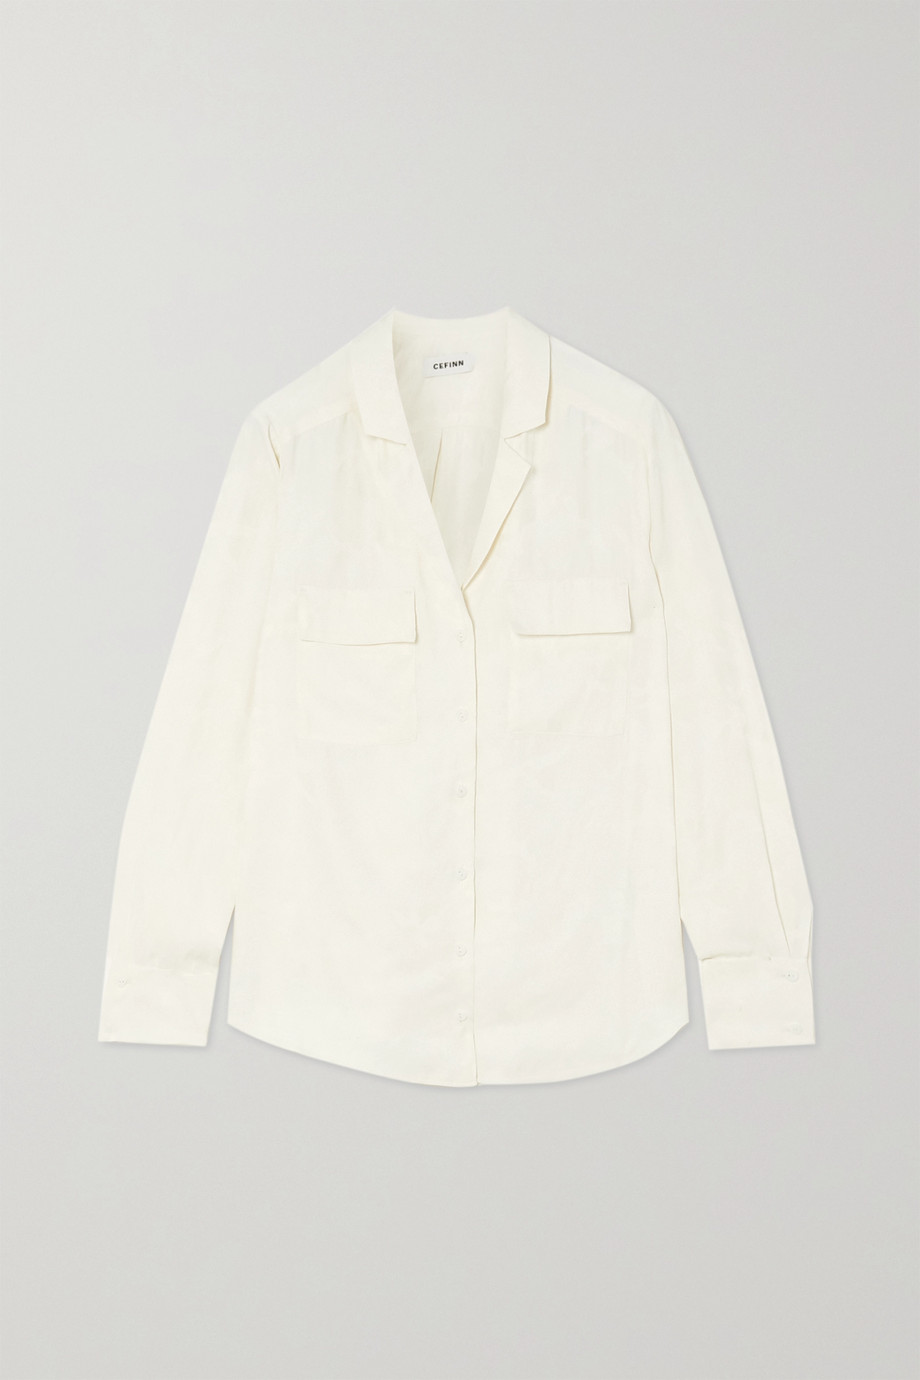 Cefinn Spencer jacquard shirt